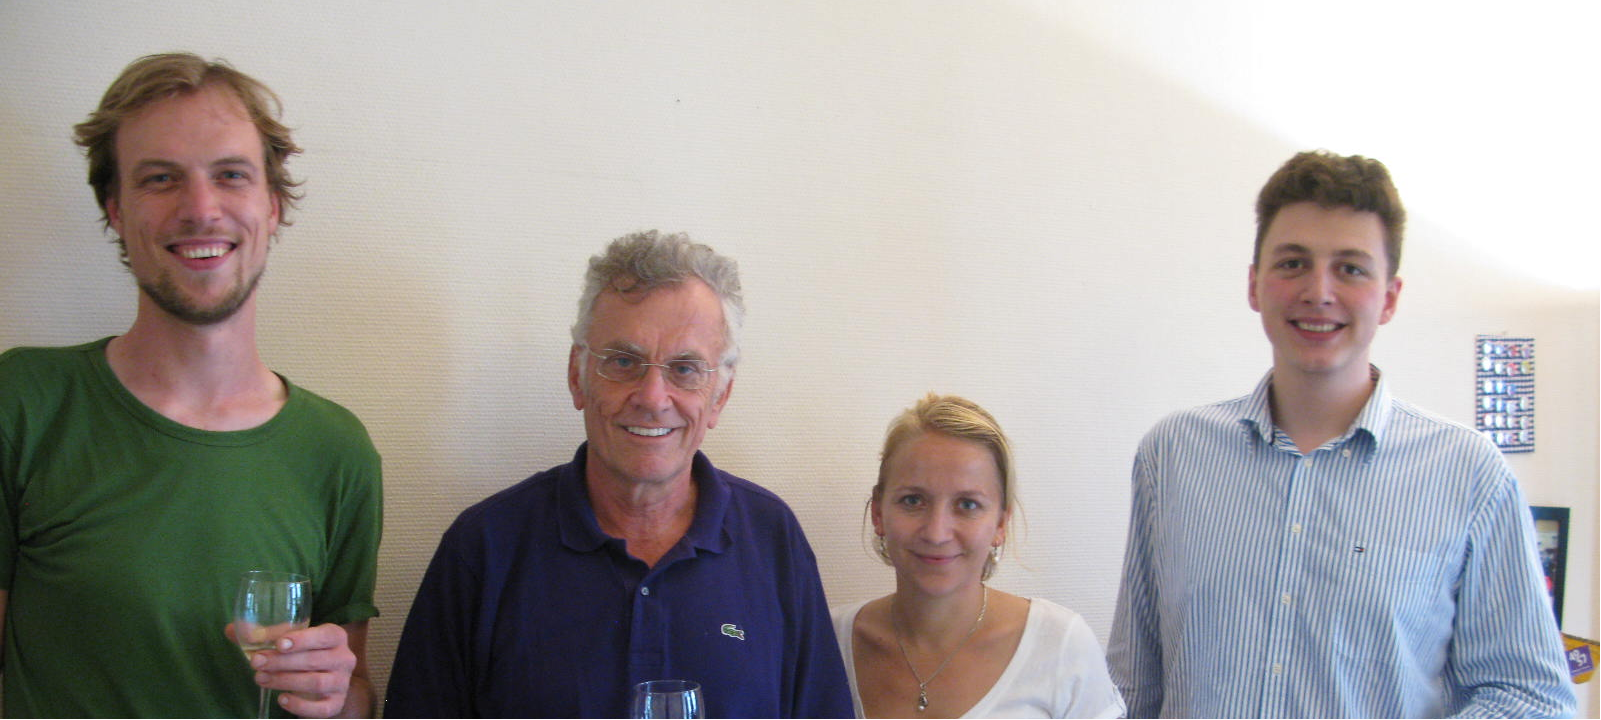 Steuergruppe Netzwerk 4057 (von links: Benjamin van Vulpen, Ueli Keller, Judith Hindermann, Marco Tomasetti)